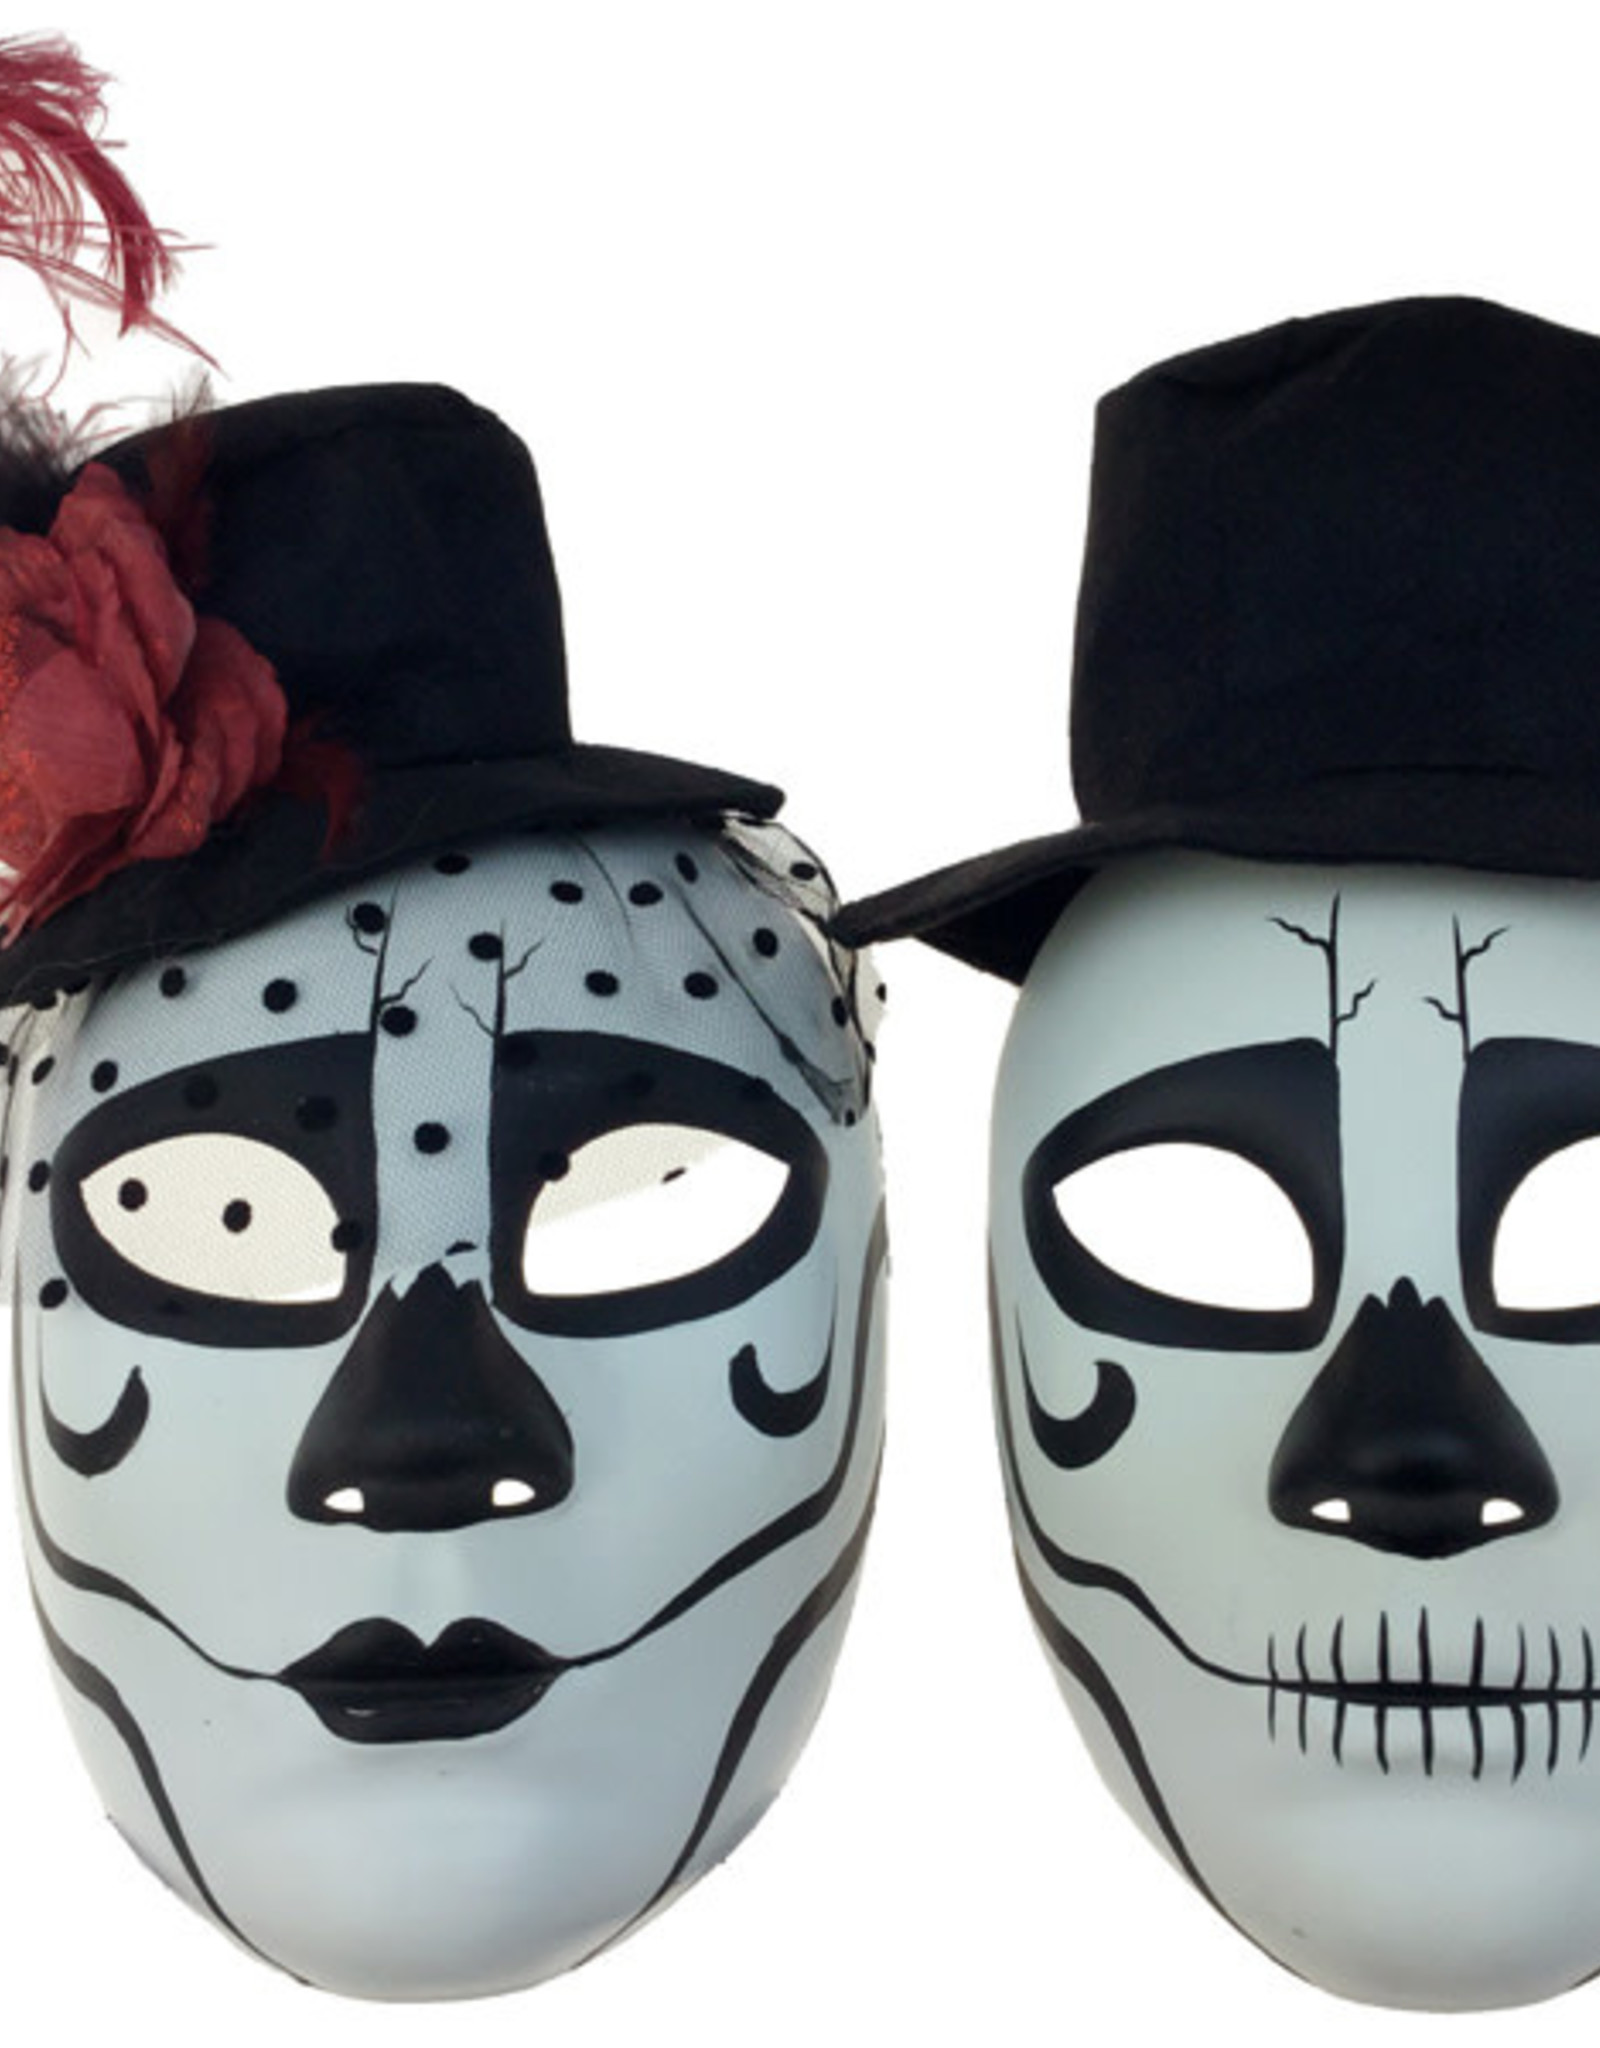 Boy's Party Mask w/ Hat